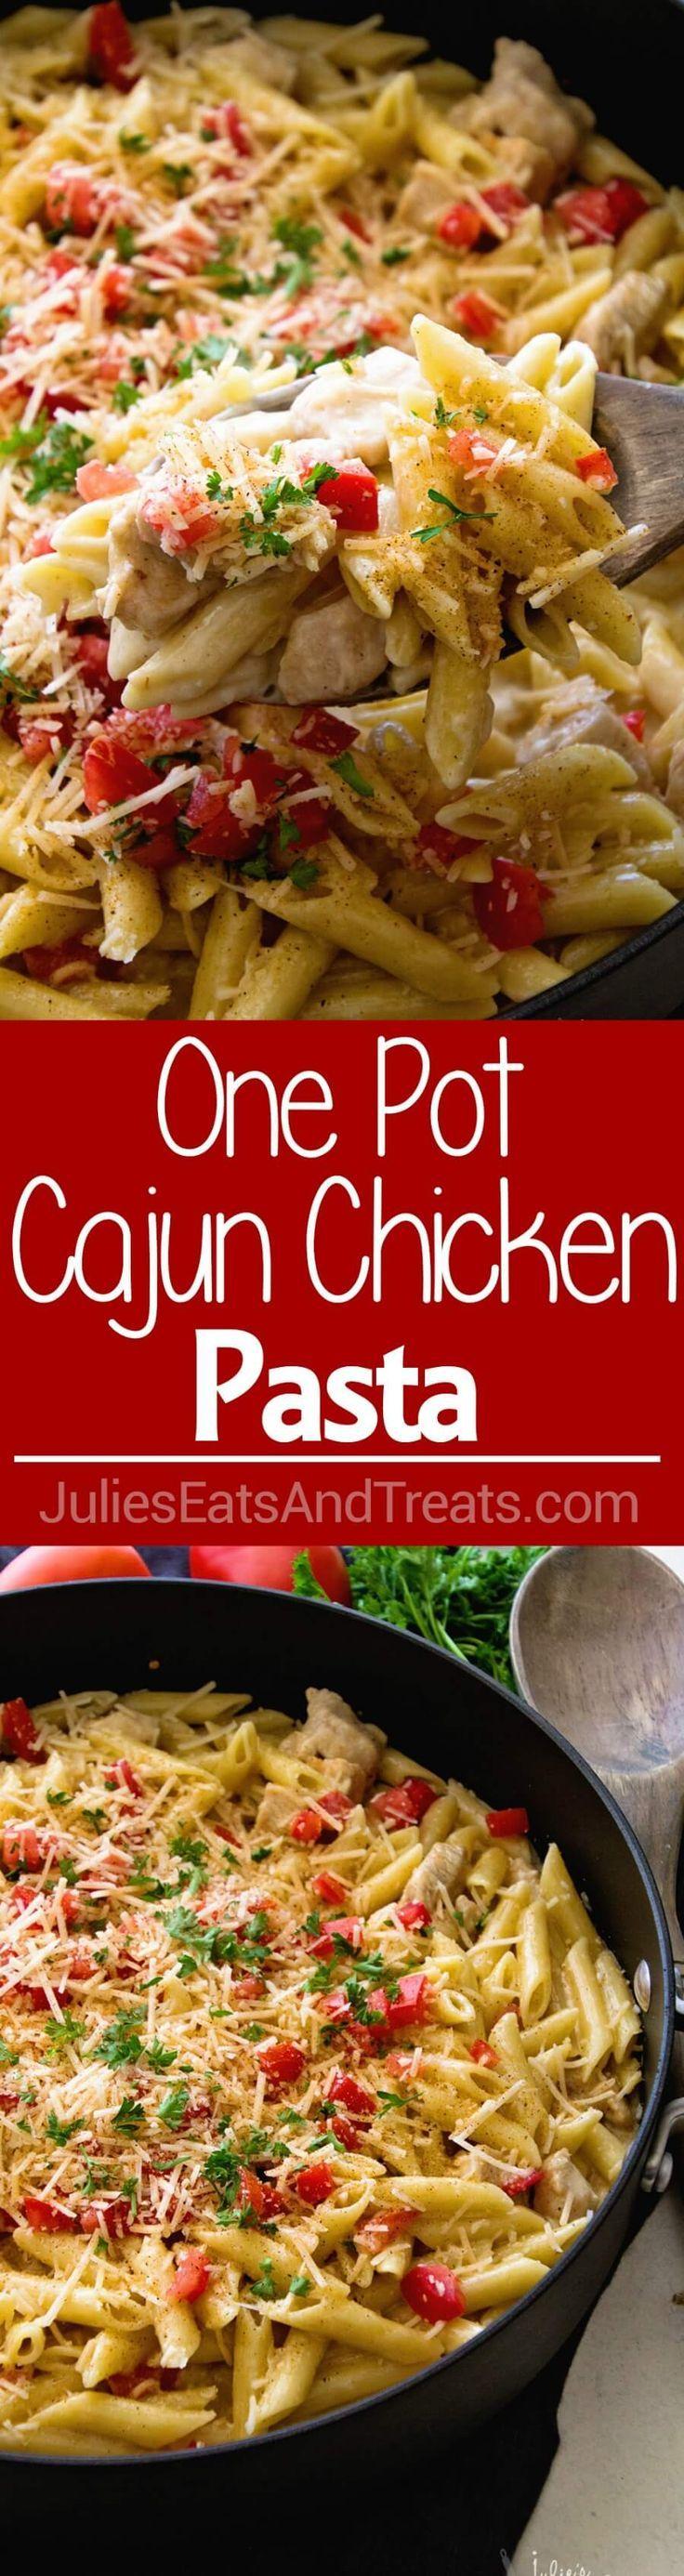 One Pot Cajun Chicken Pasta ~  Creamy Pasta Sauce with Chicken, Cheese and the…#CrystalFarmsCheese #CheeseLove #ad